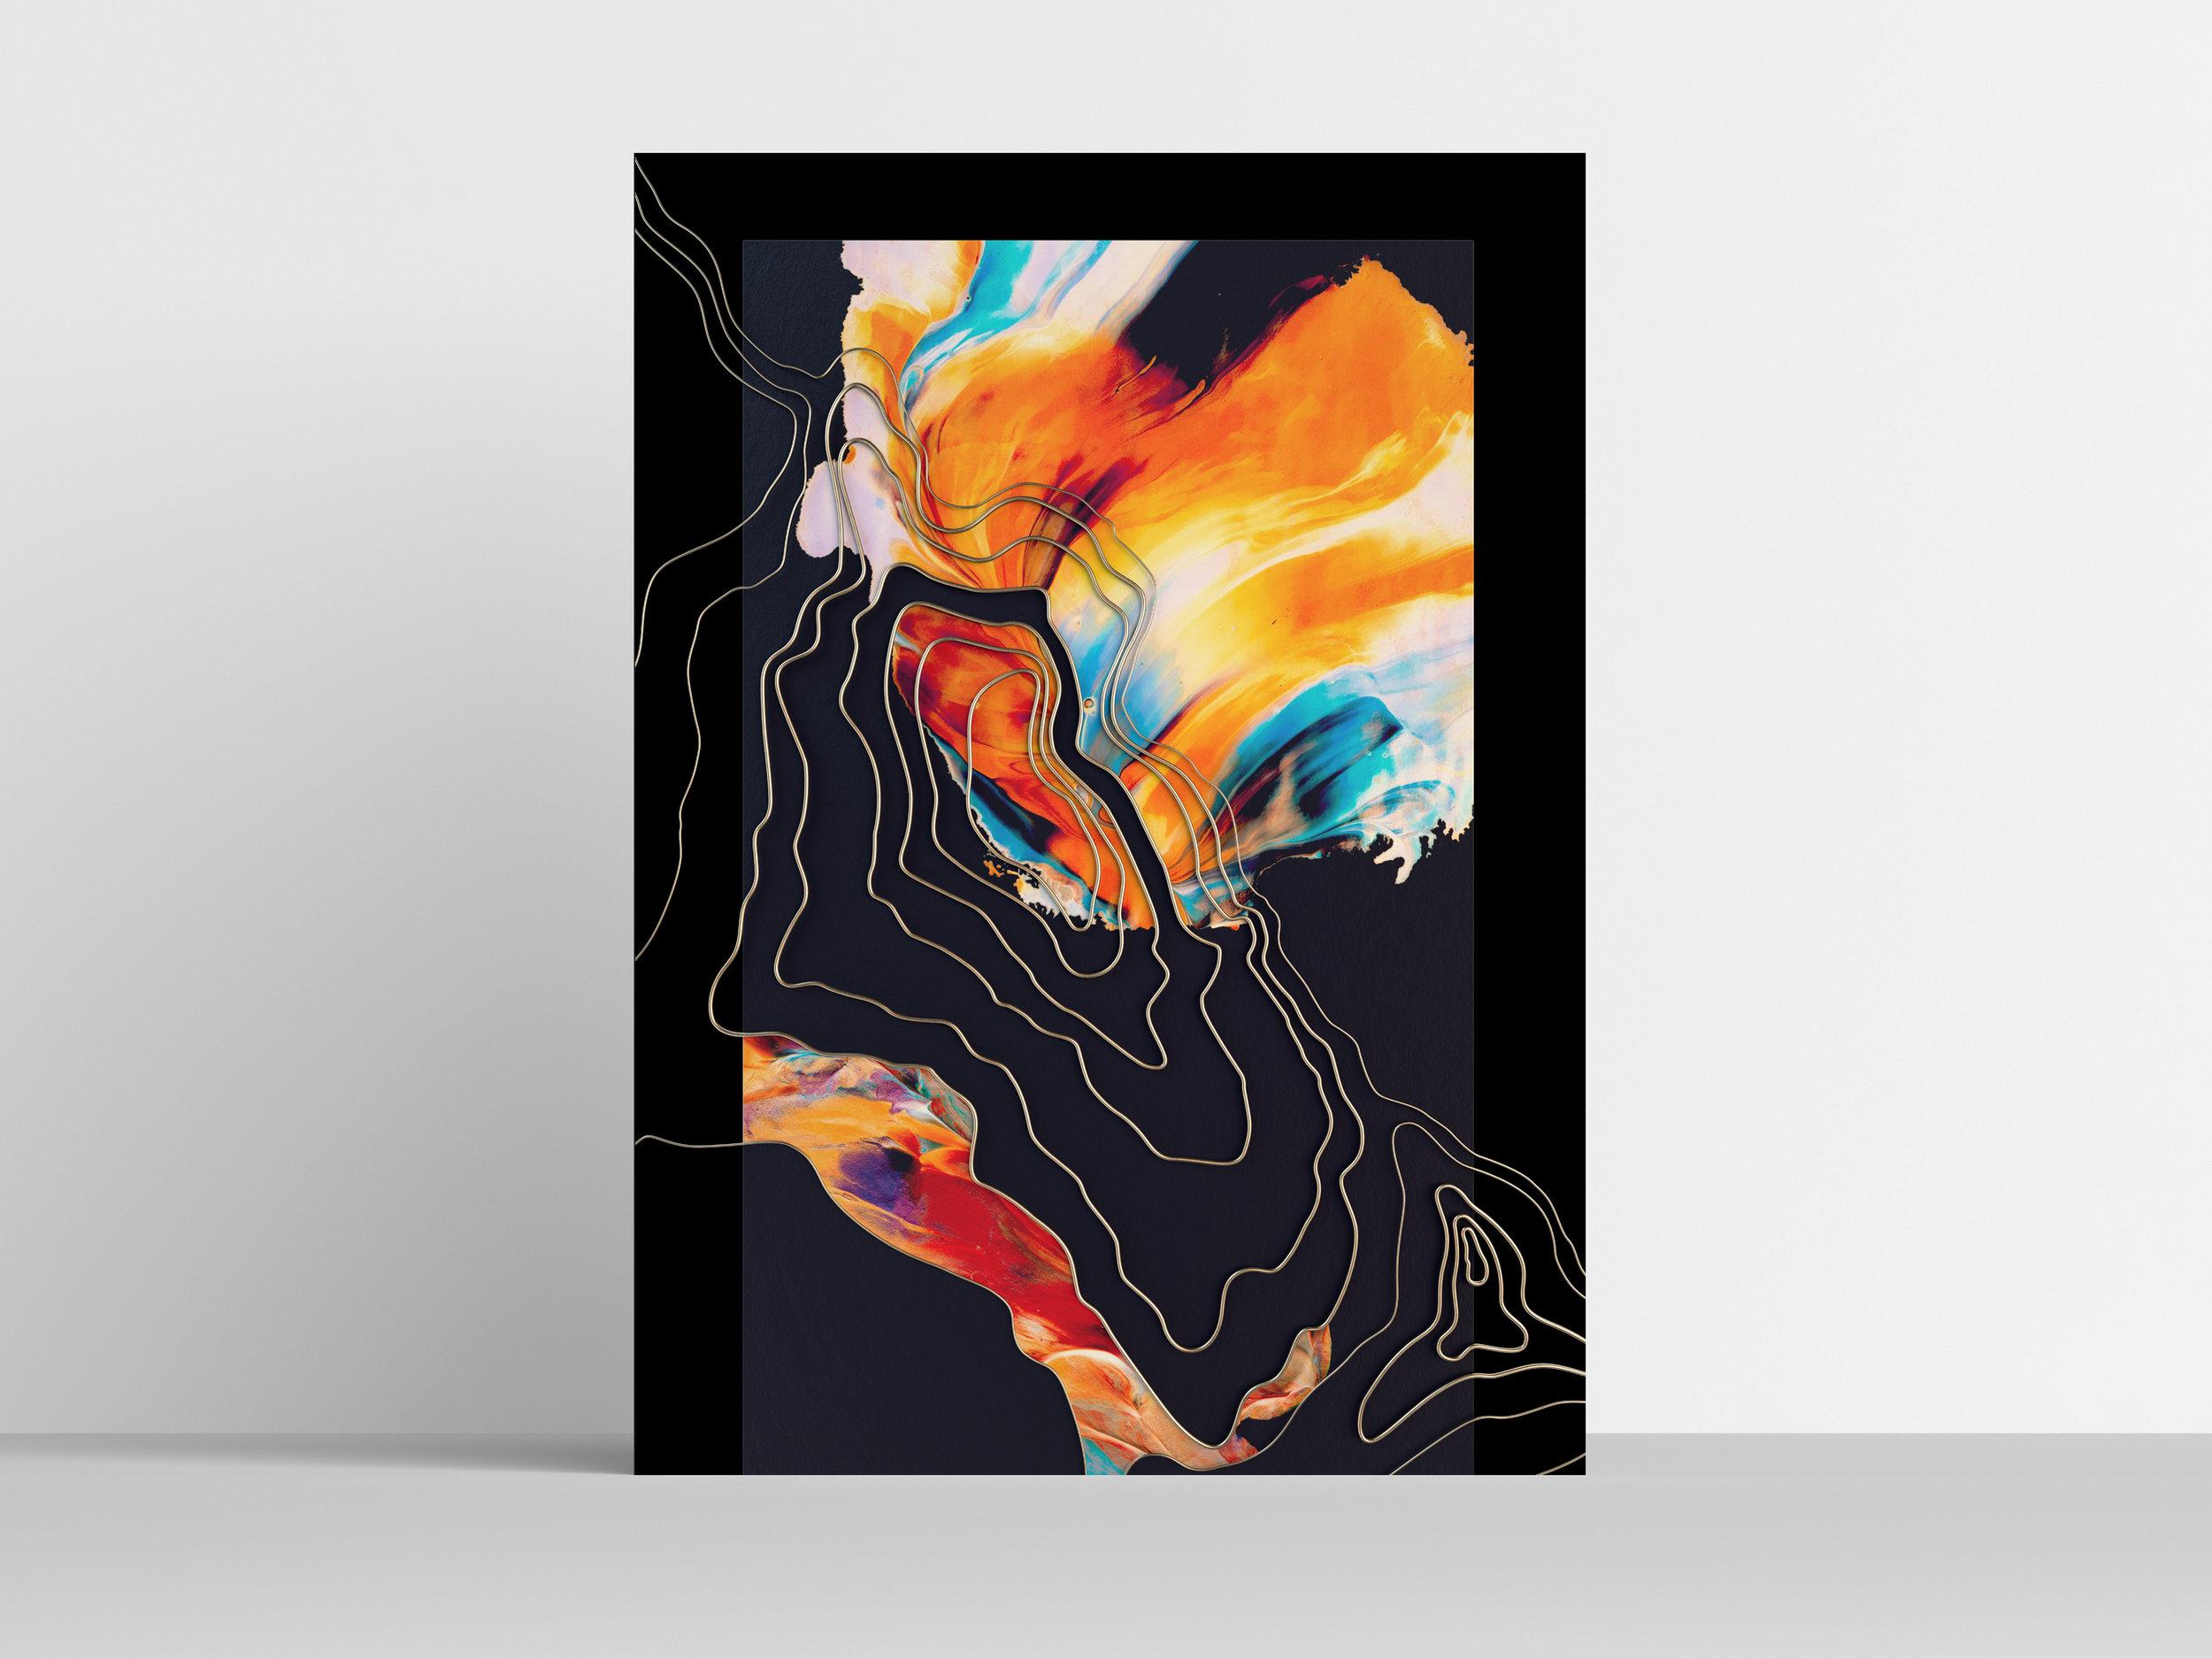 One+Poster+Mockup_gold_lines.jpg